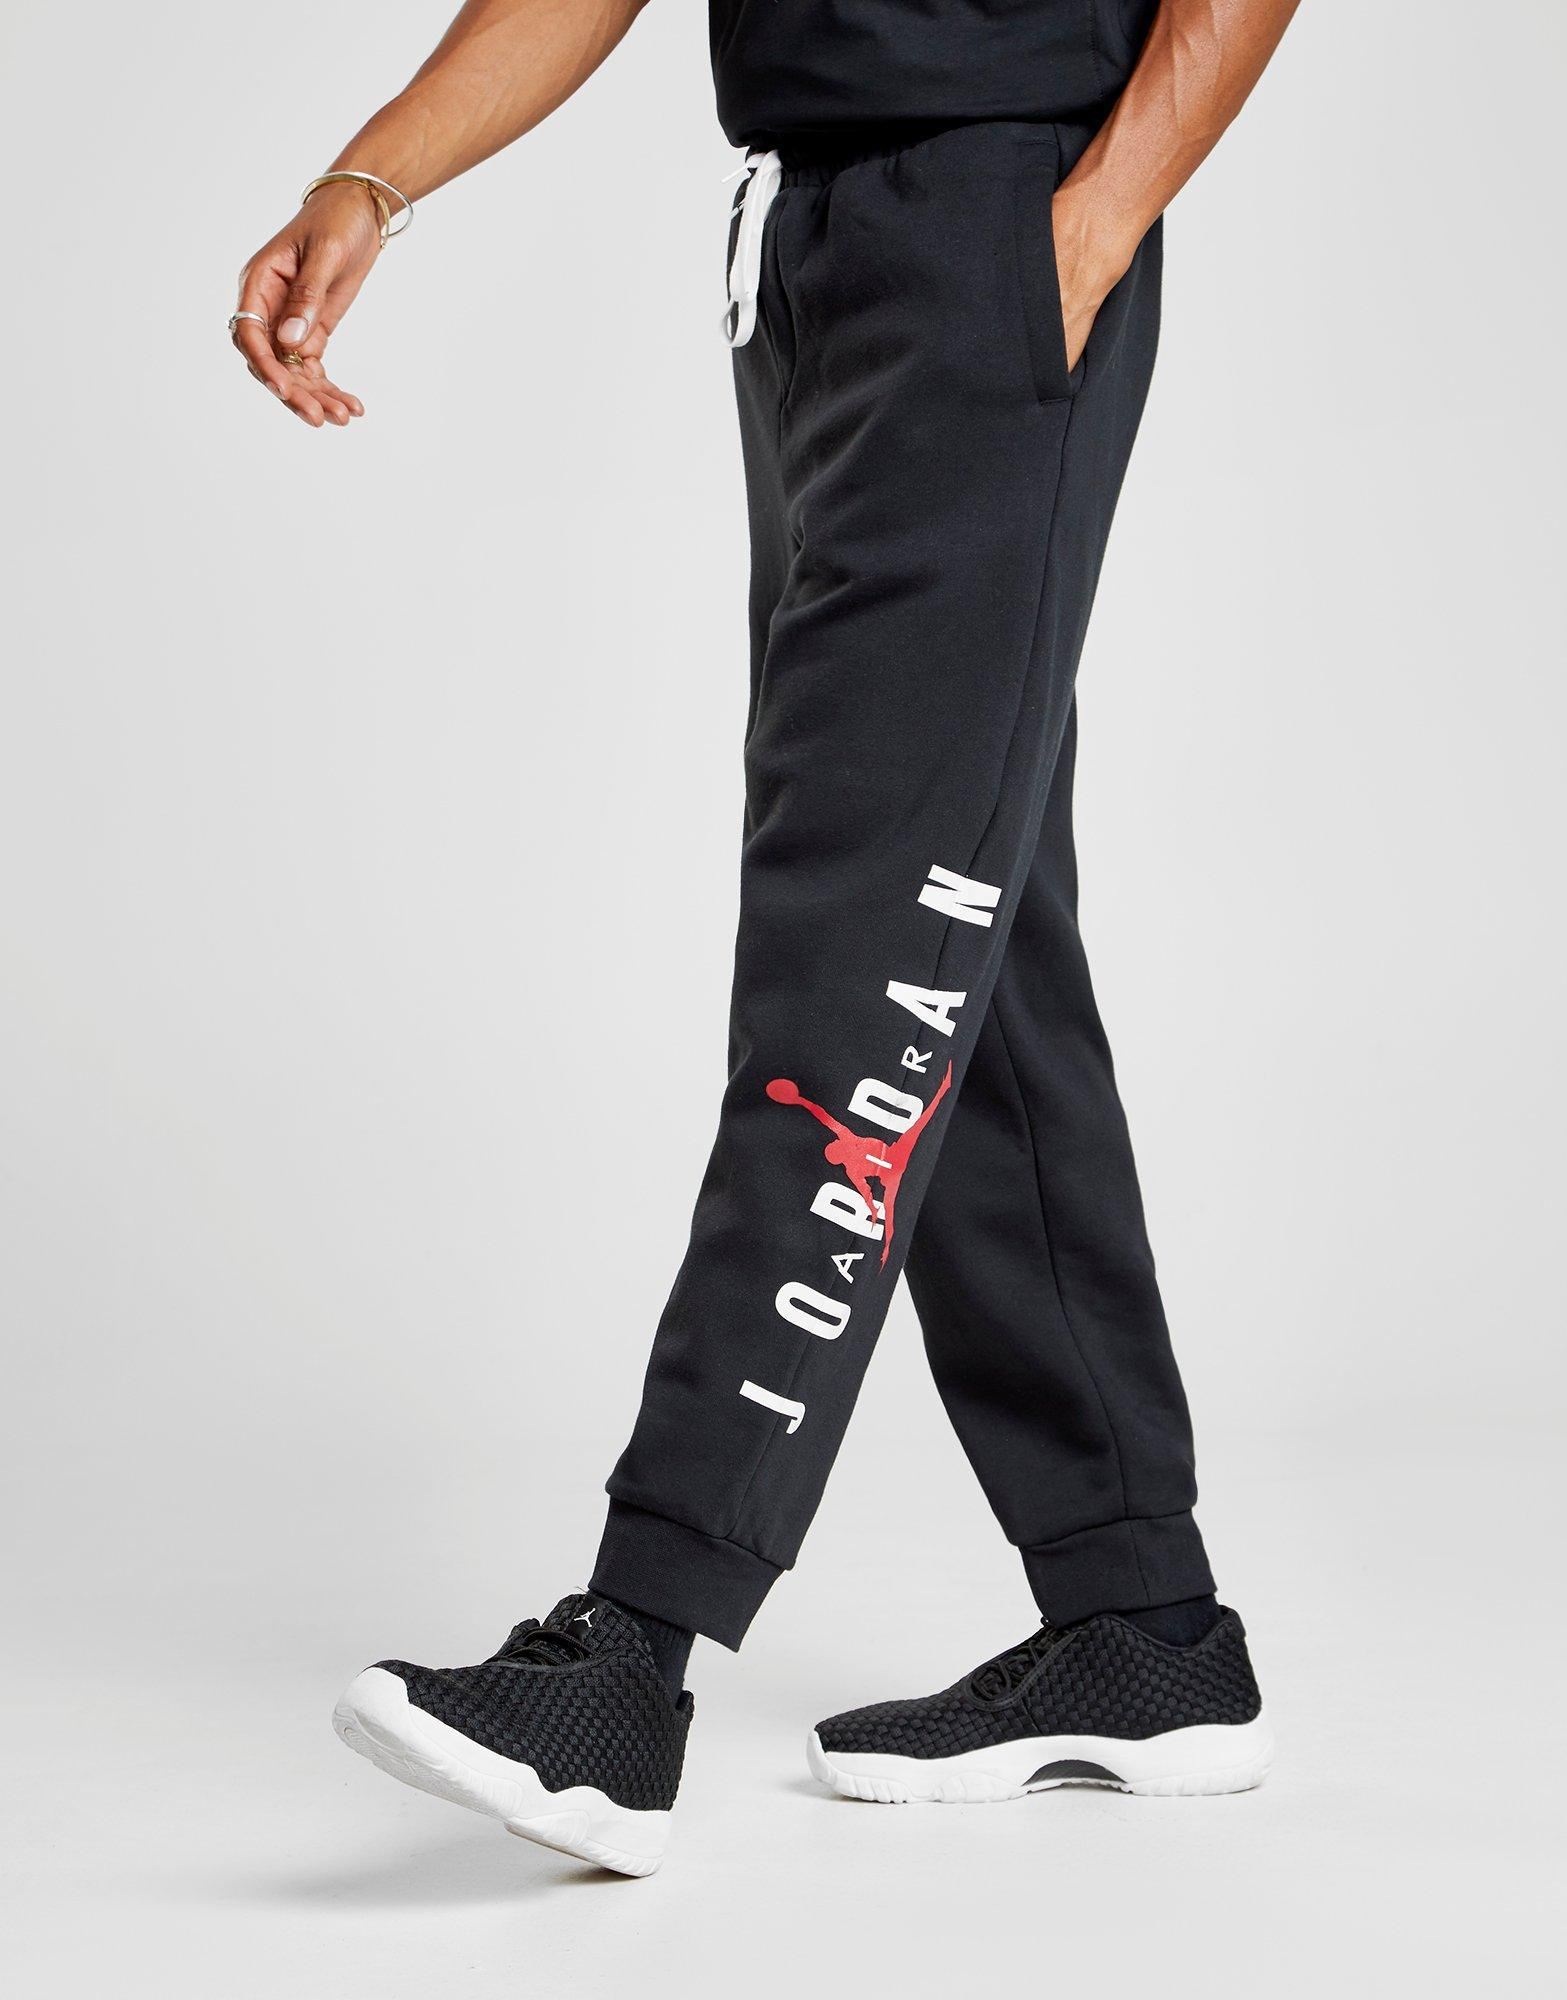 803823386cfb Lyst - Nike Jumpman Track Pants in Black for Men